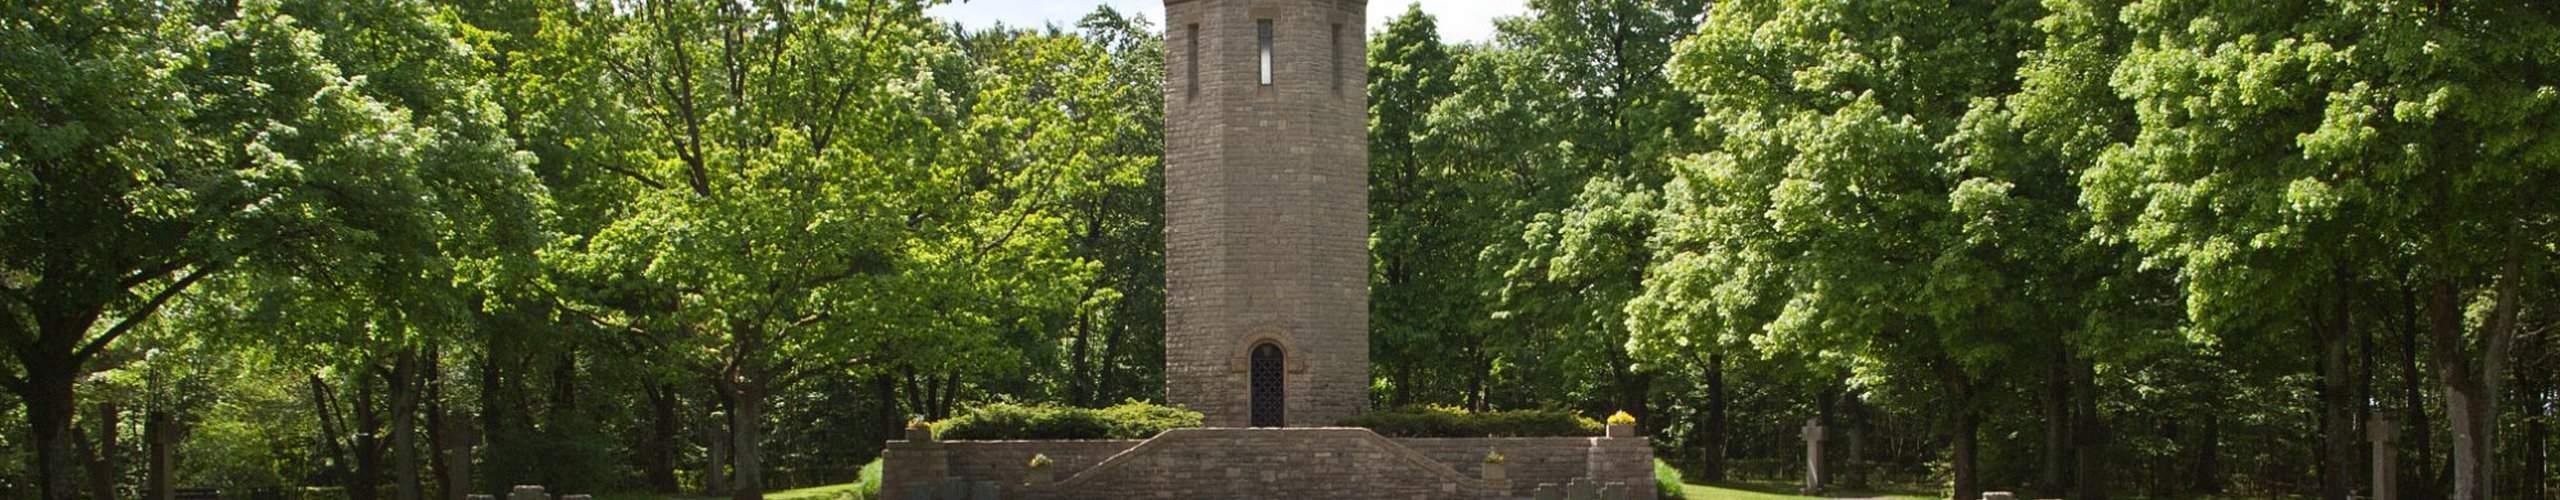 ehrenfriedhof kolmeshohe